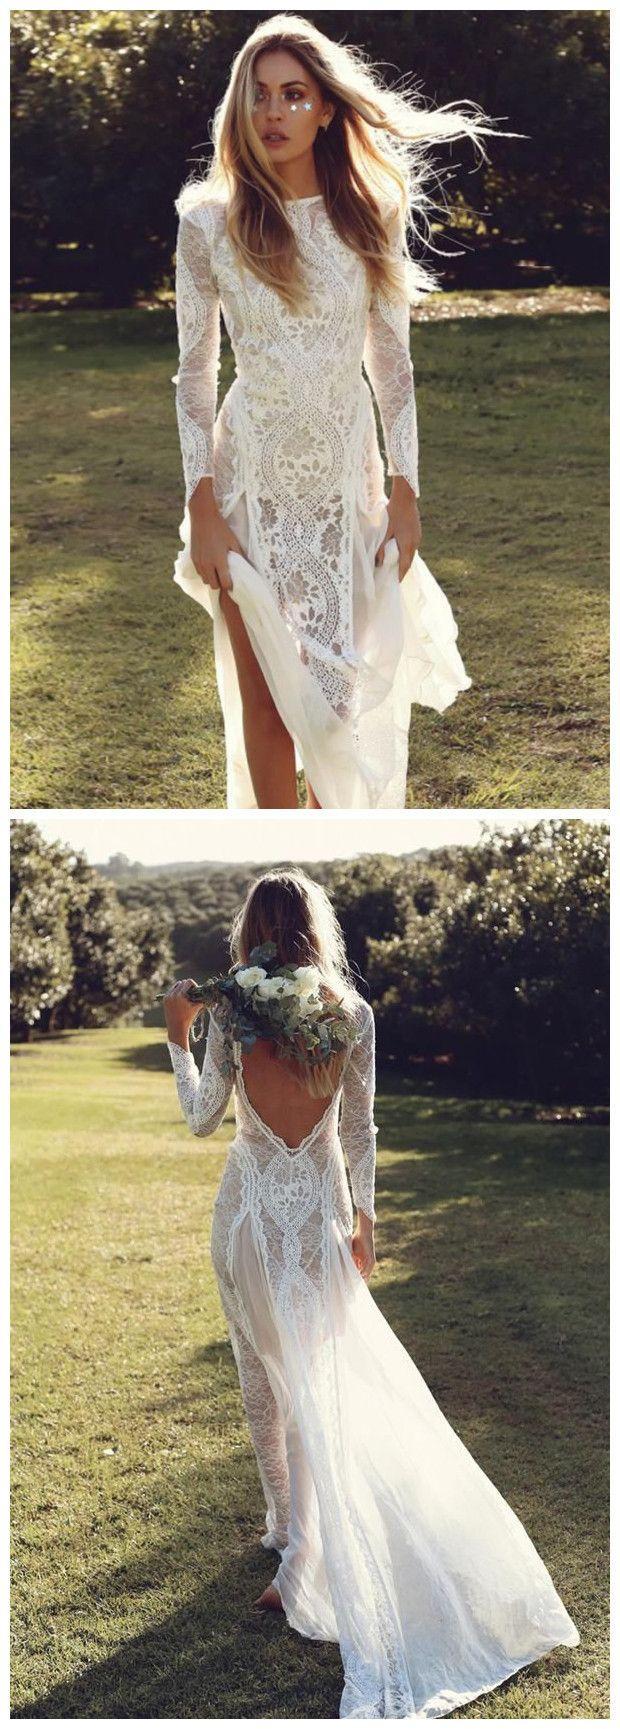 Sheathcolumn bateau lace wedding dress with long sleeve open back